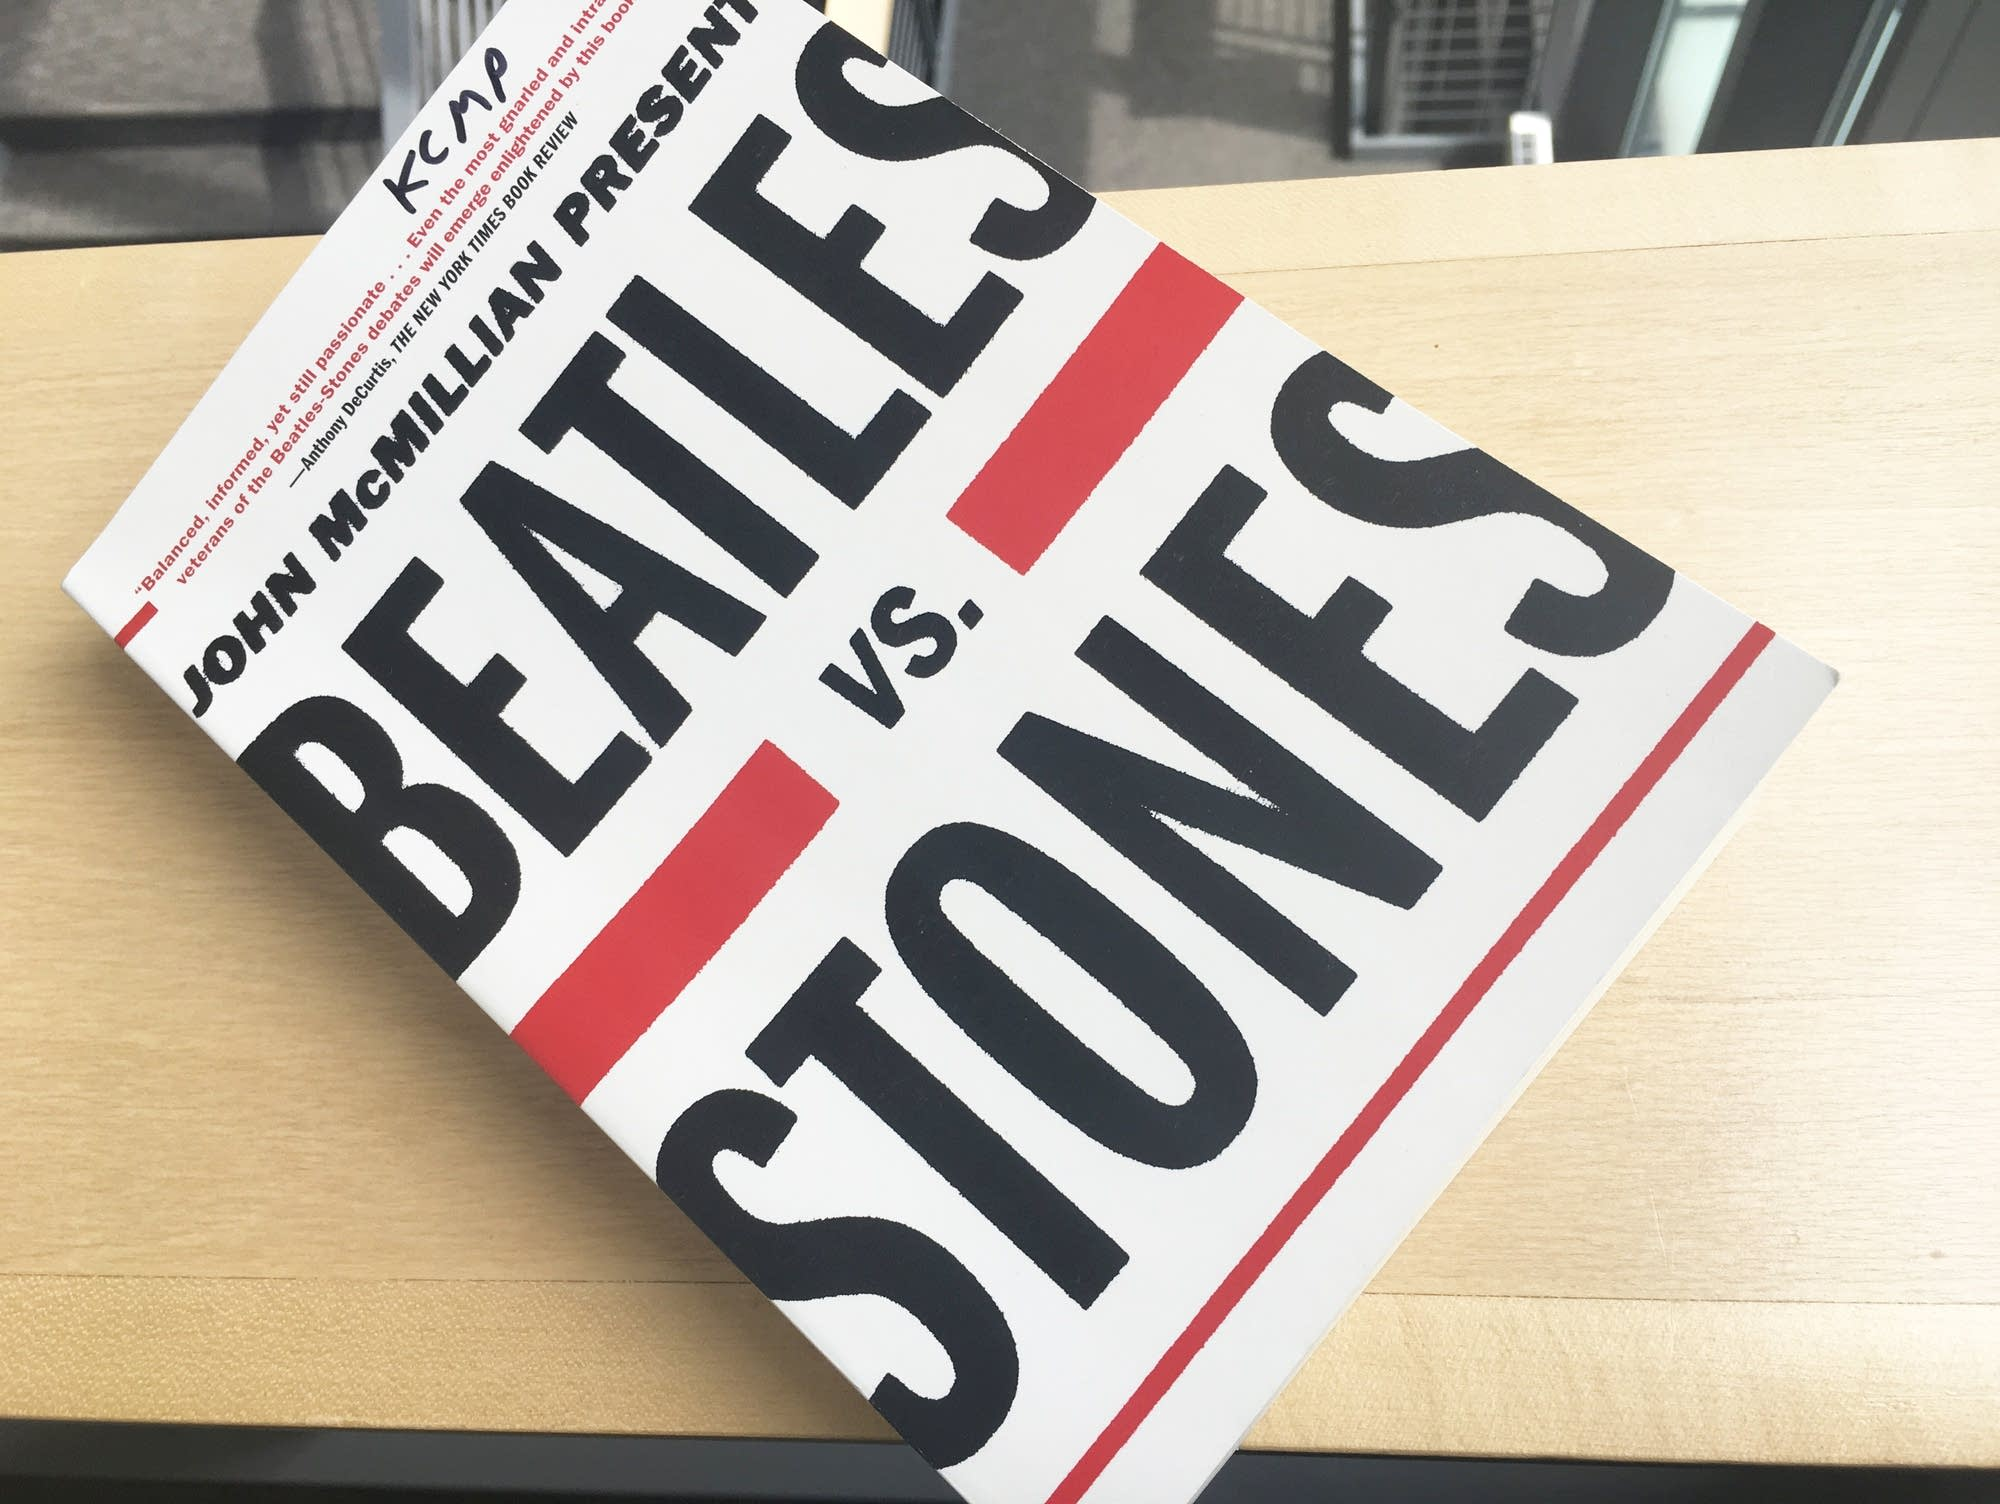 John McMillan's 'Beatles vs. Stones'